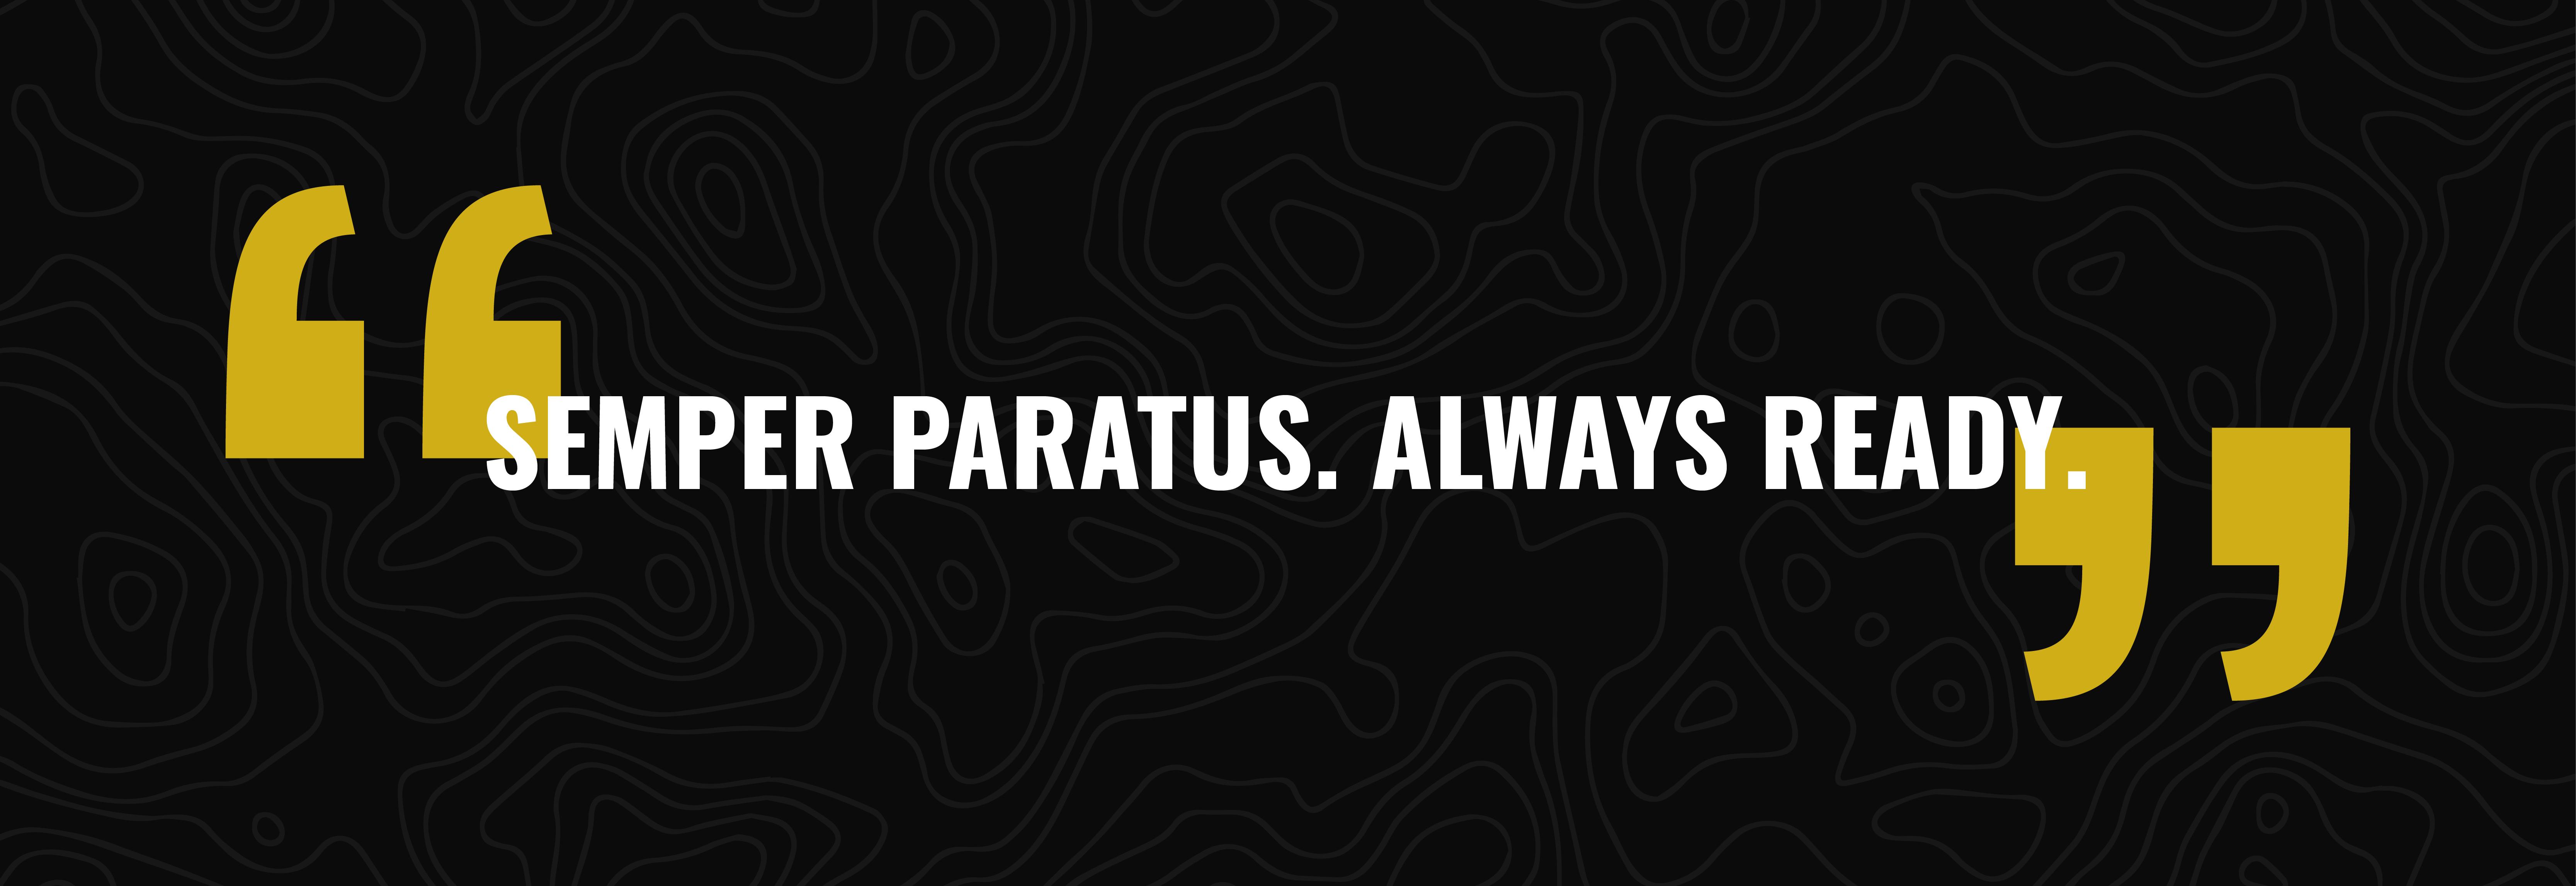 """Semper Paratus. Always ready."" - United States Coast Guard Motto"